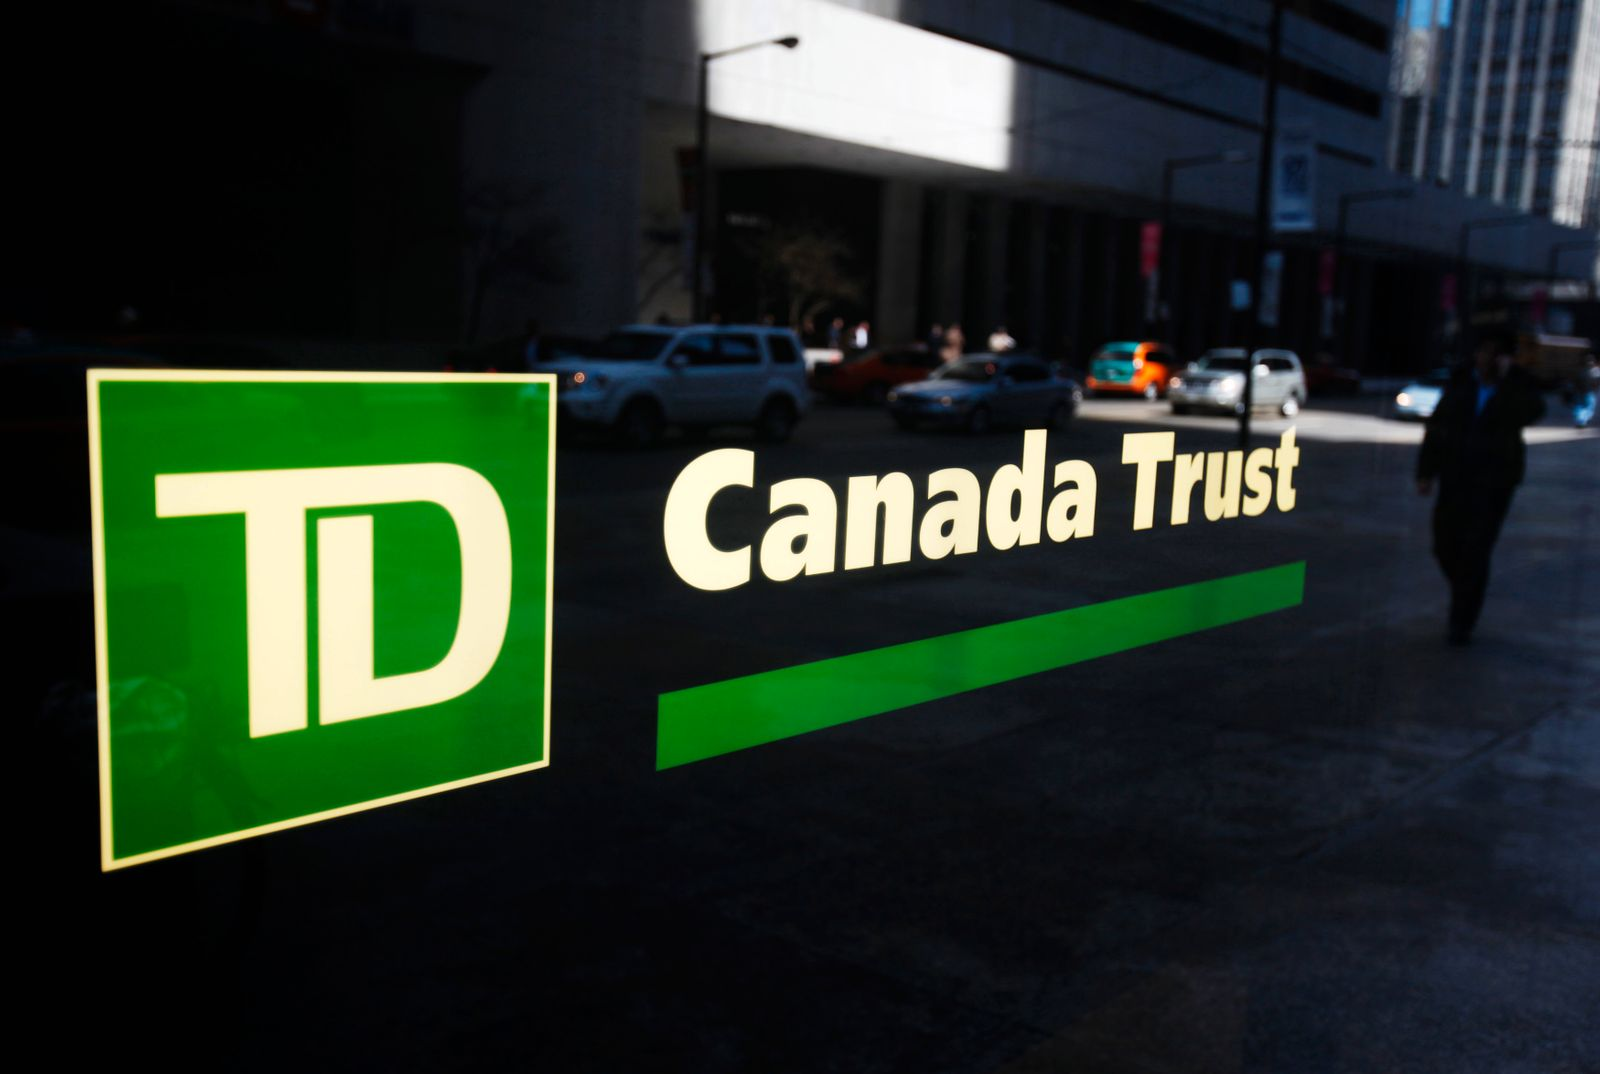 DT Canada Trust / Toronto-Dominion